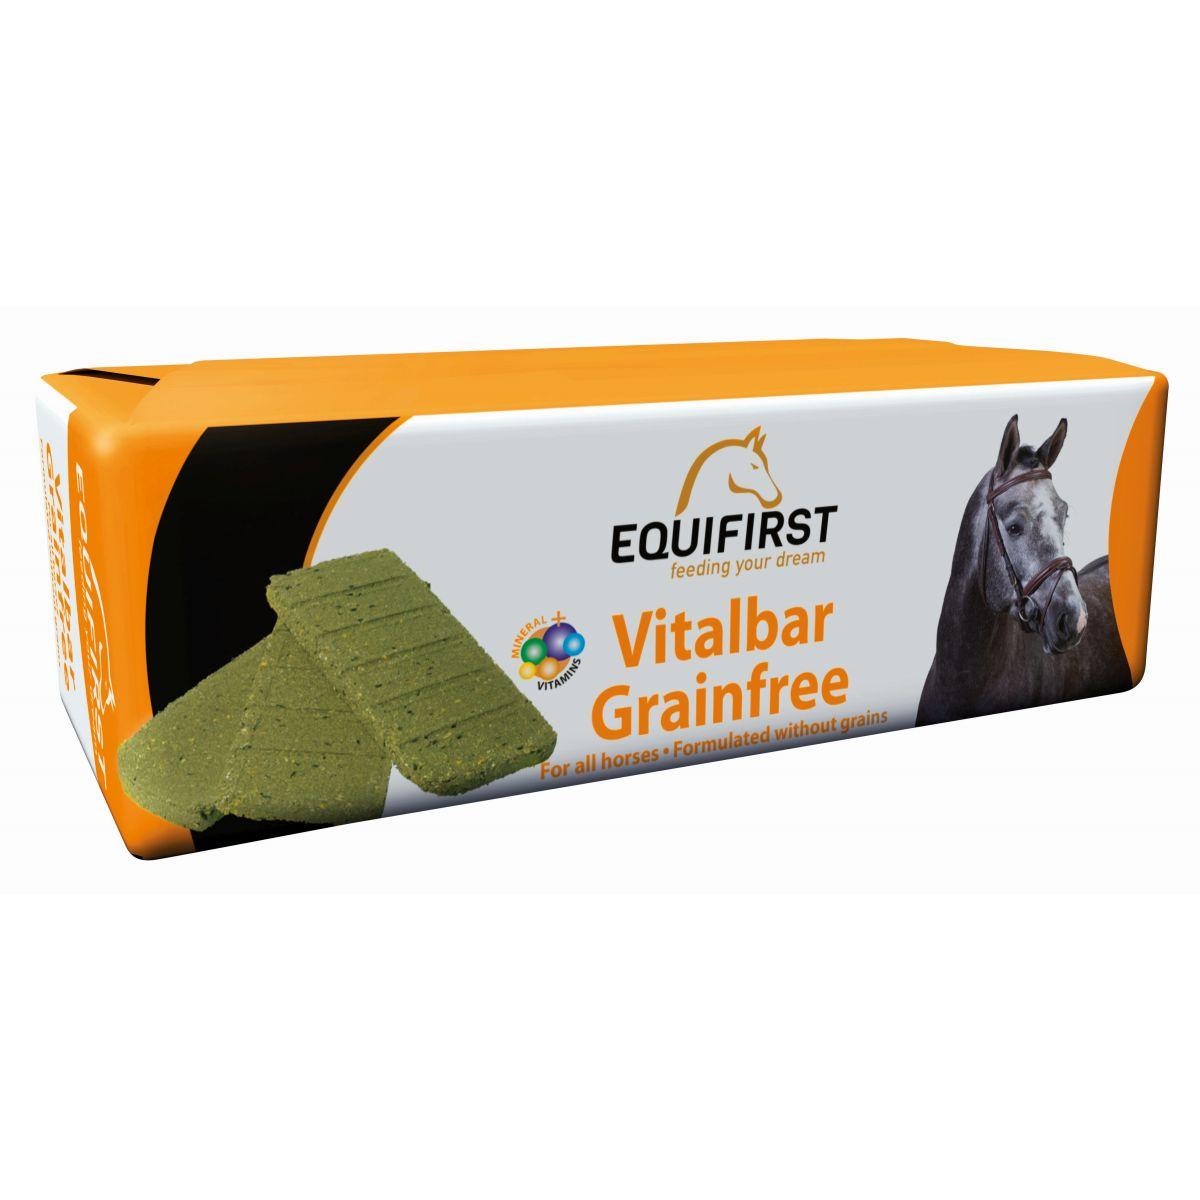 EQF VITALBAR GRAINFREE 4,5KG N 00001